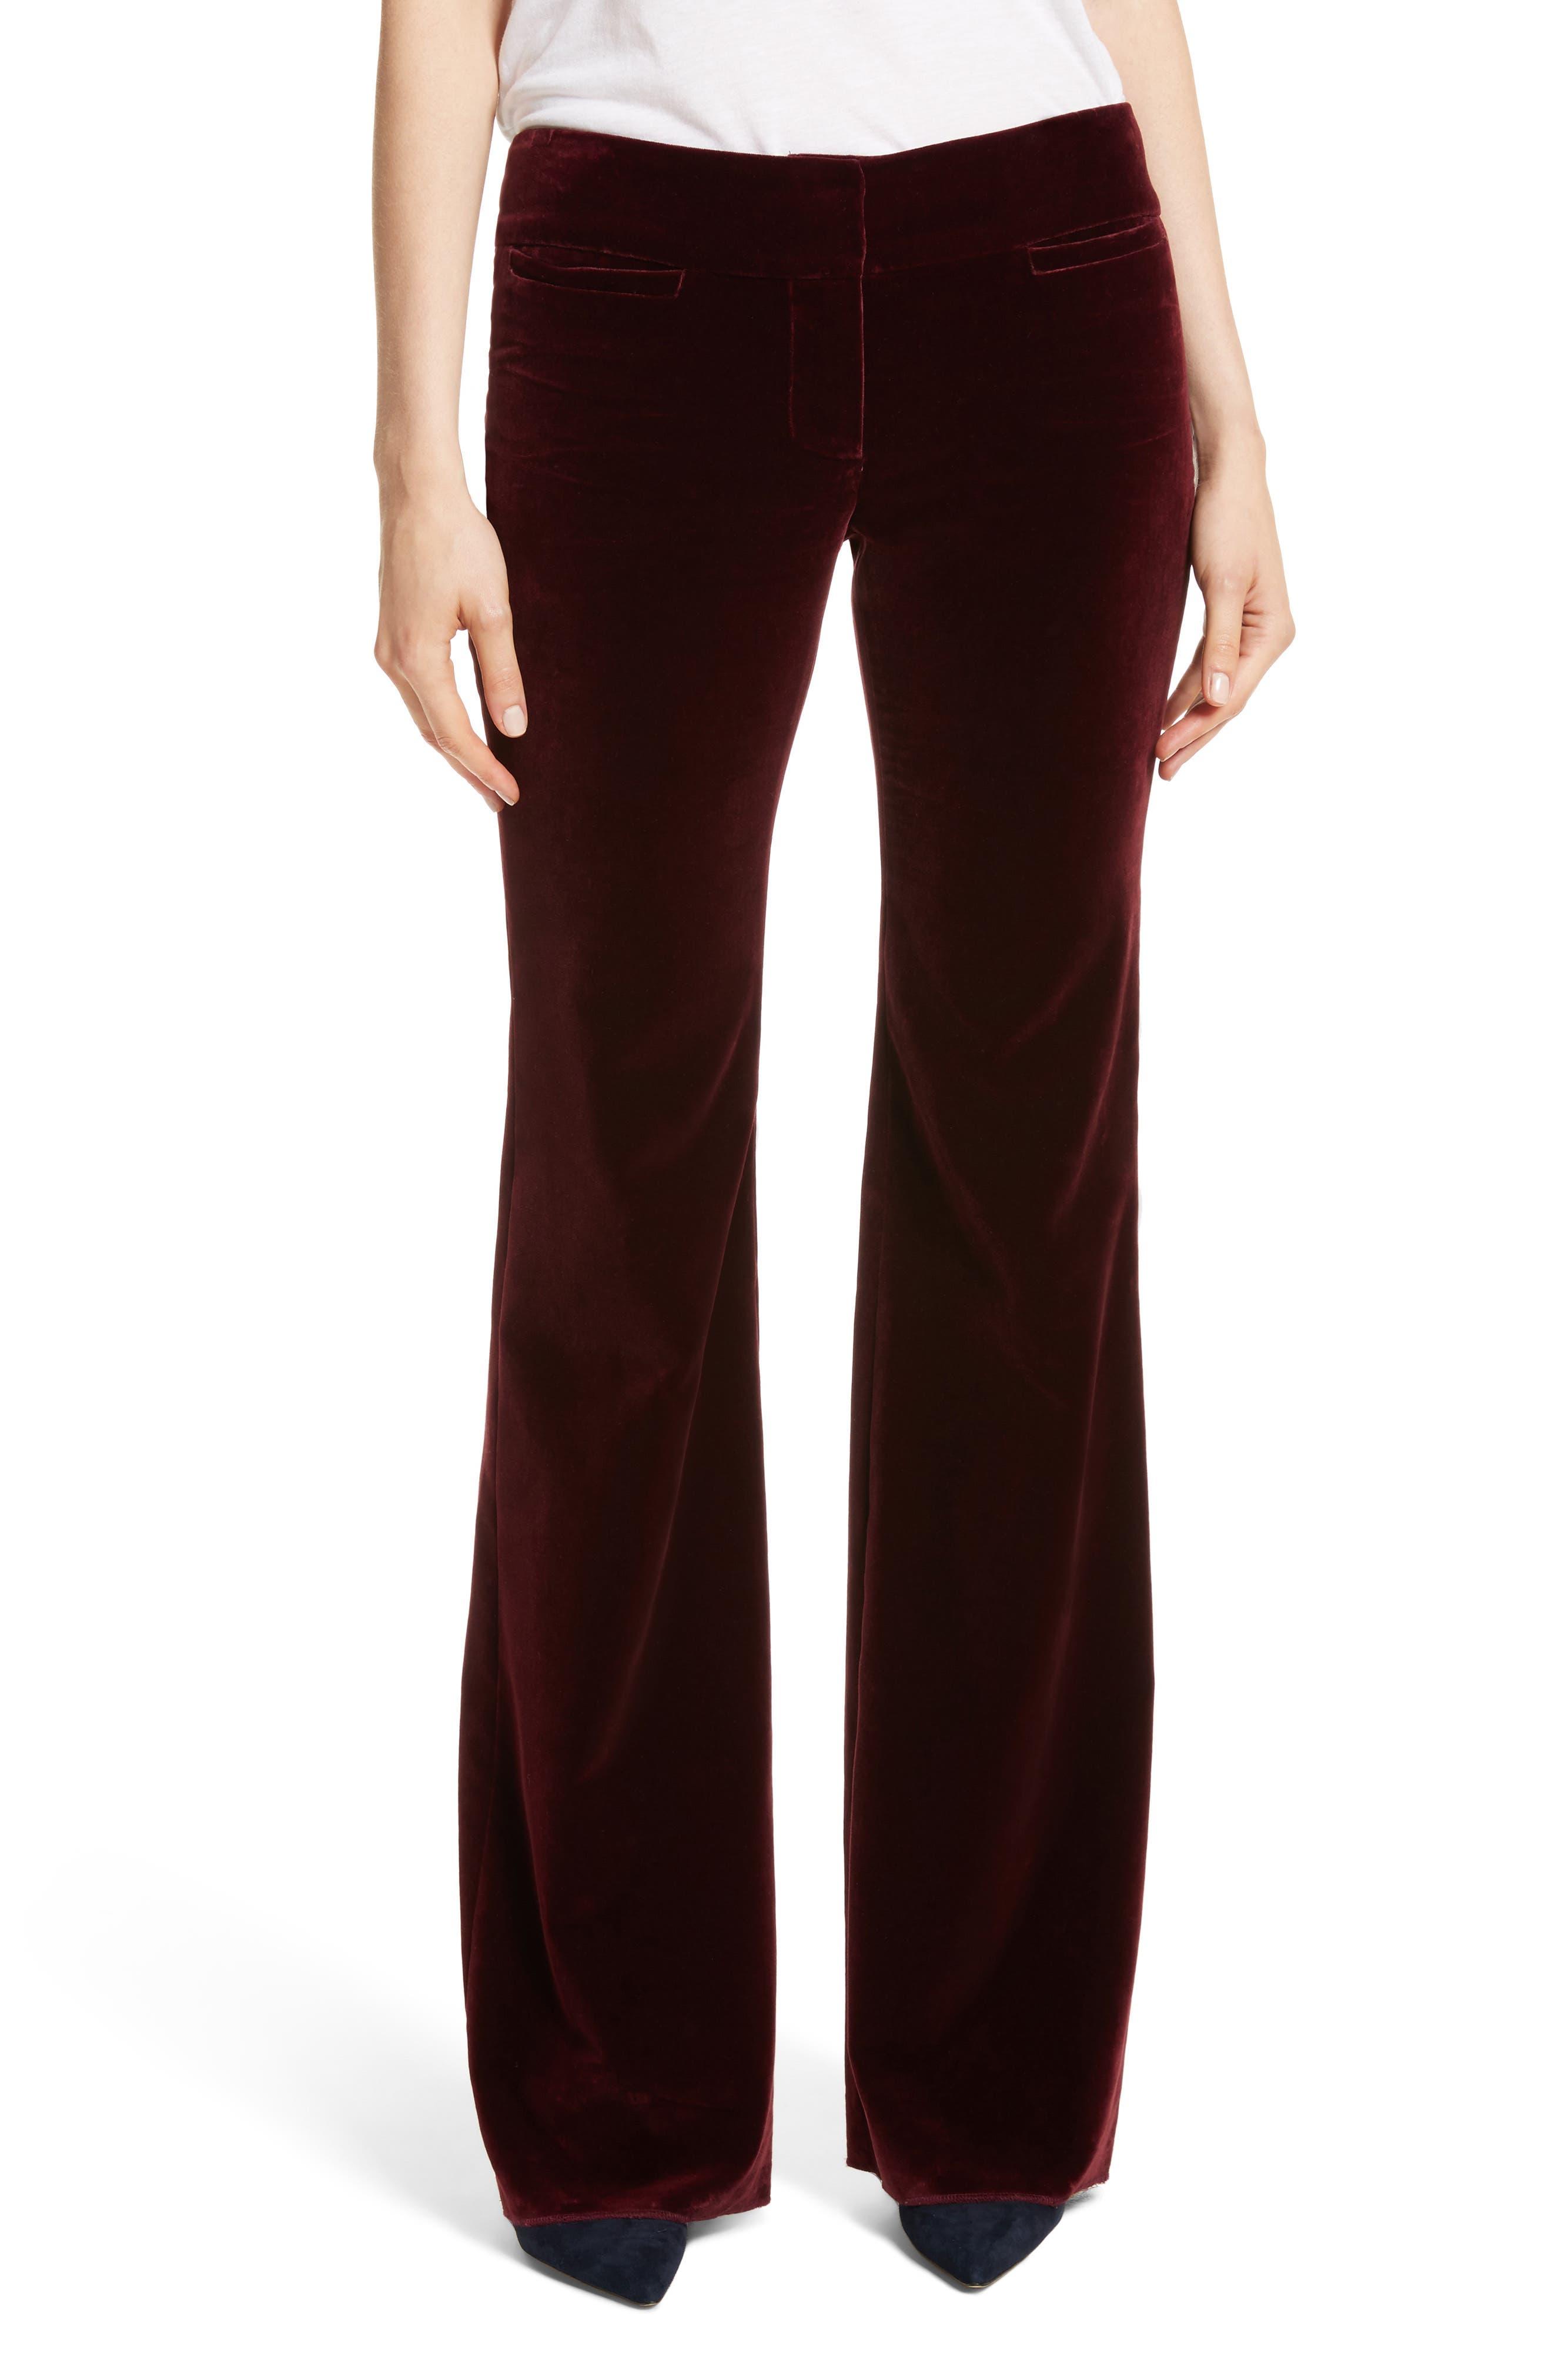 Amoire Velvet Flare Pants,                         Main,                         color, 603